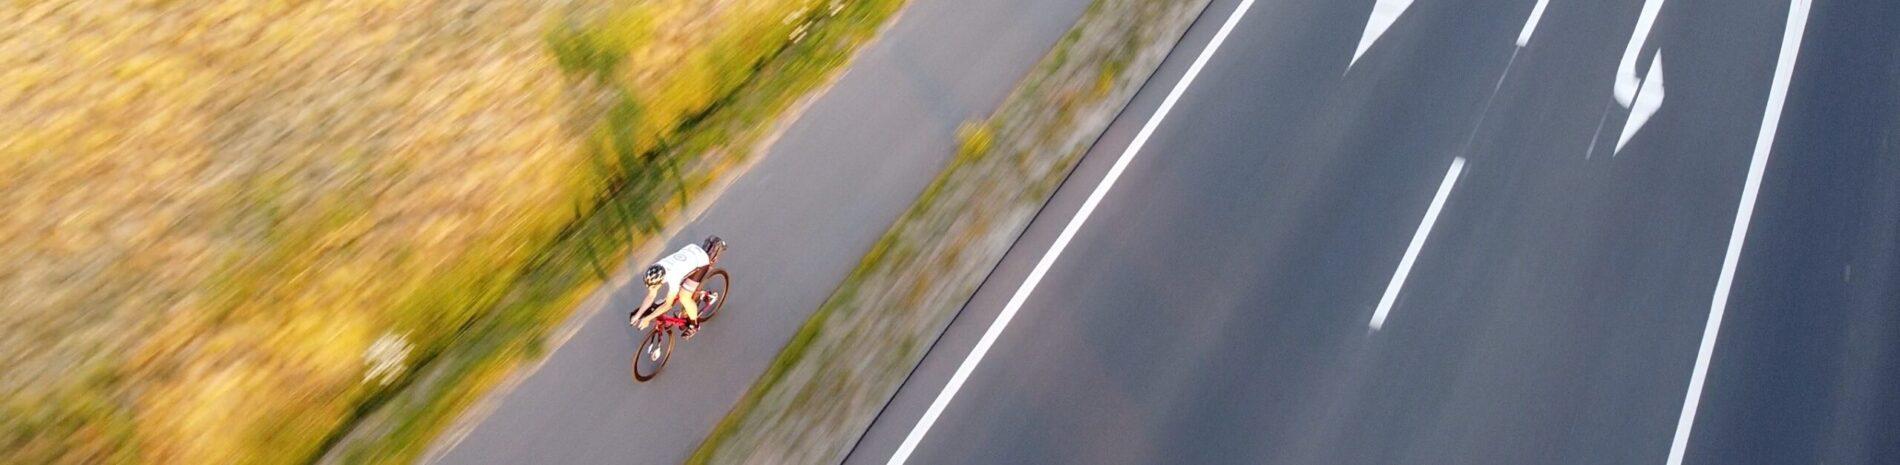 Bert on the road